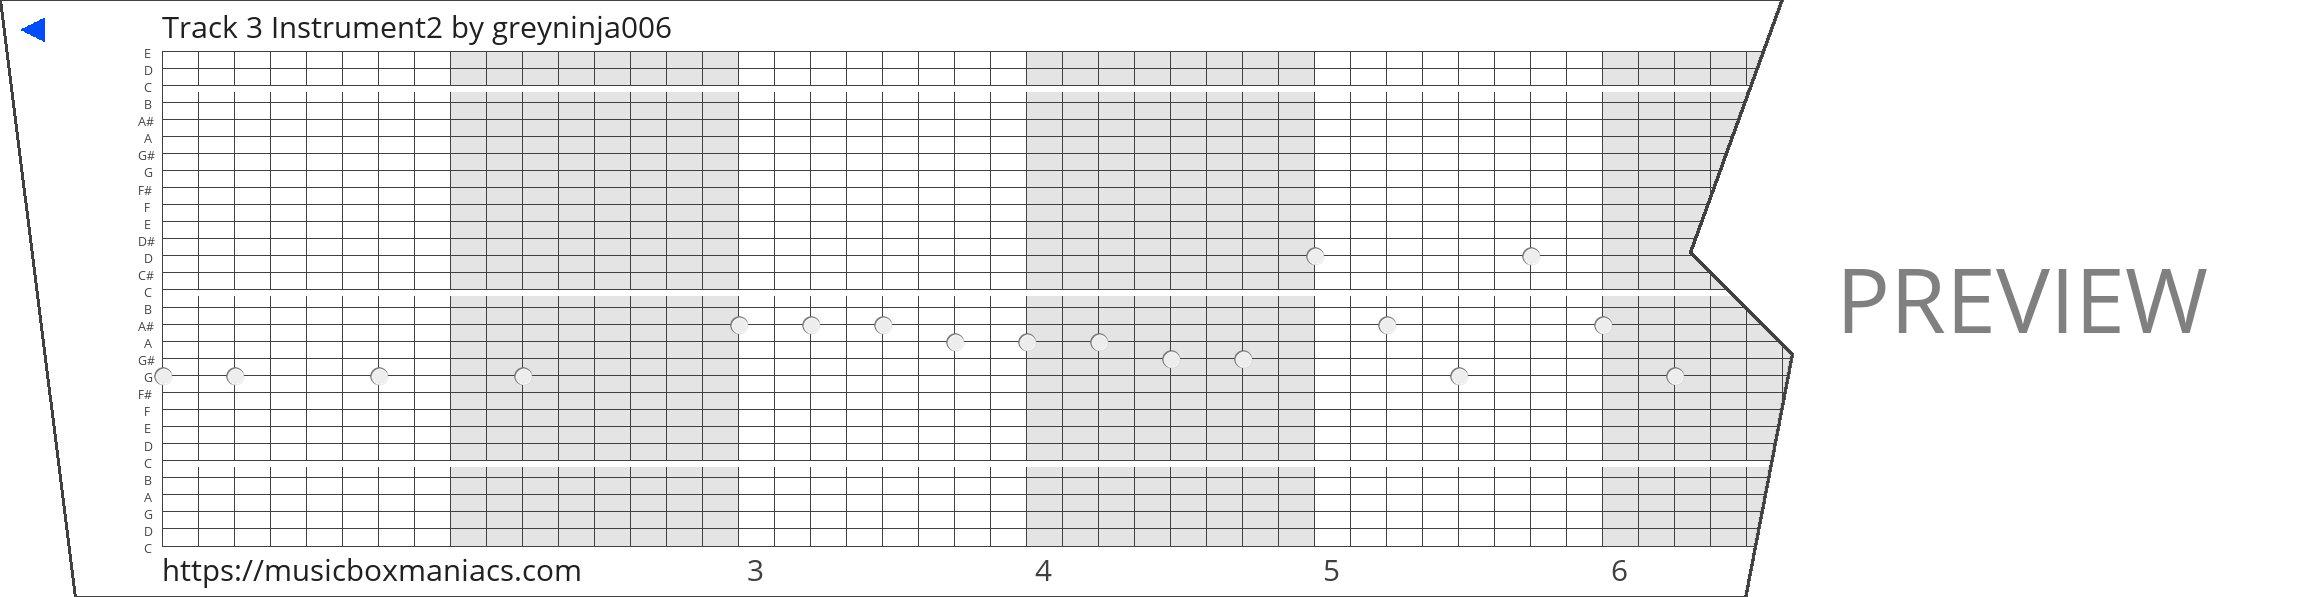 Track 3 Instrument2 30 note music box paper strip